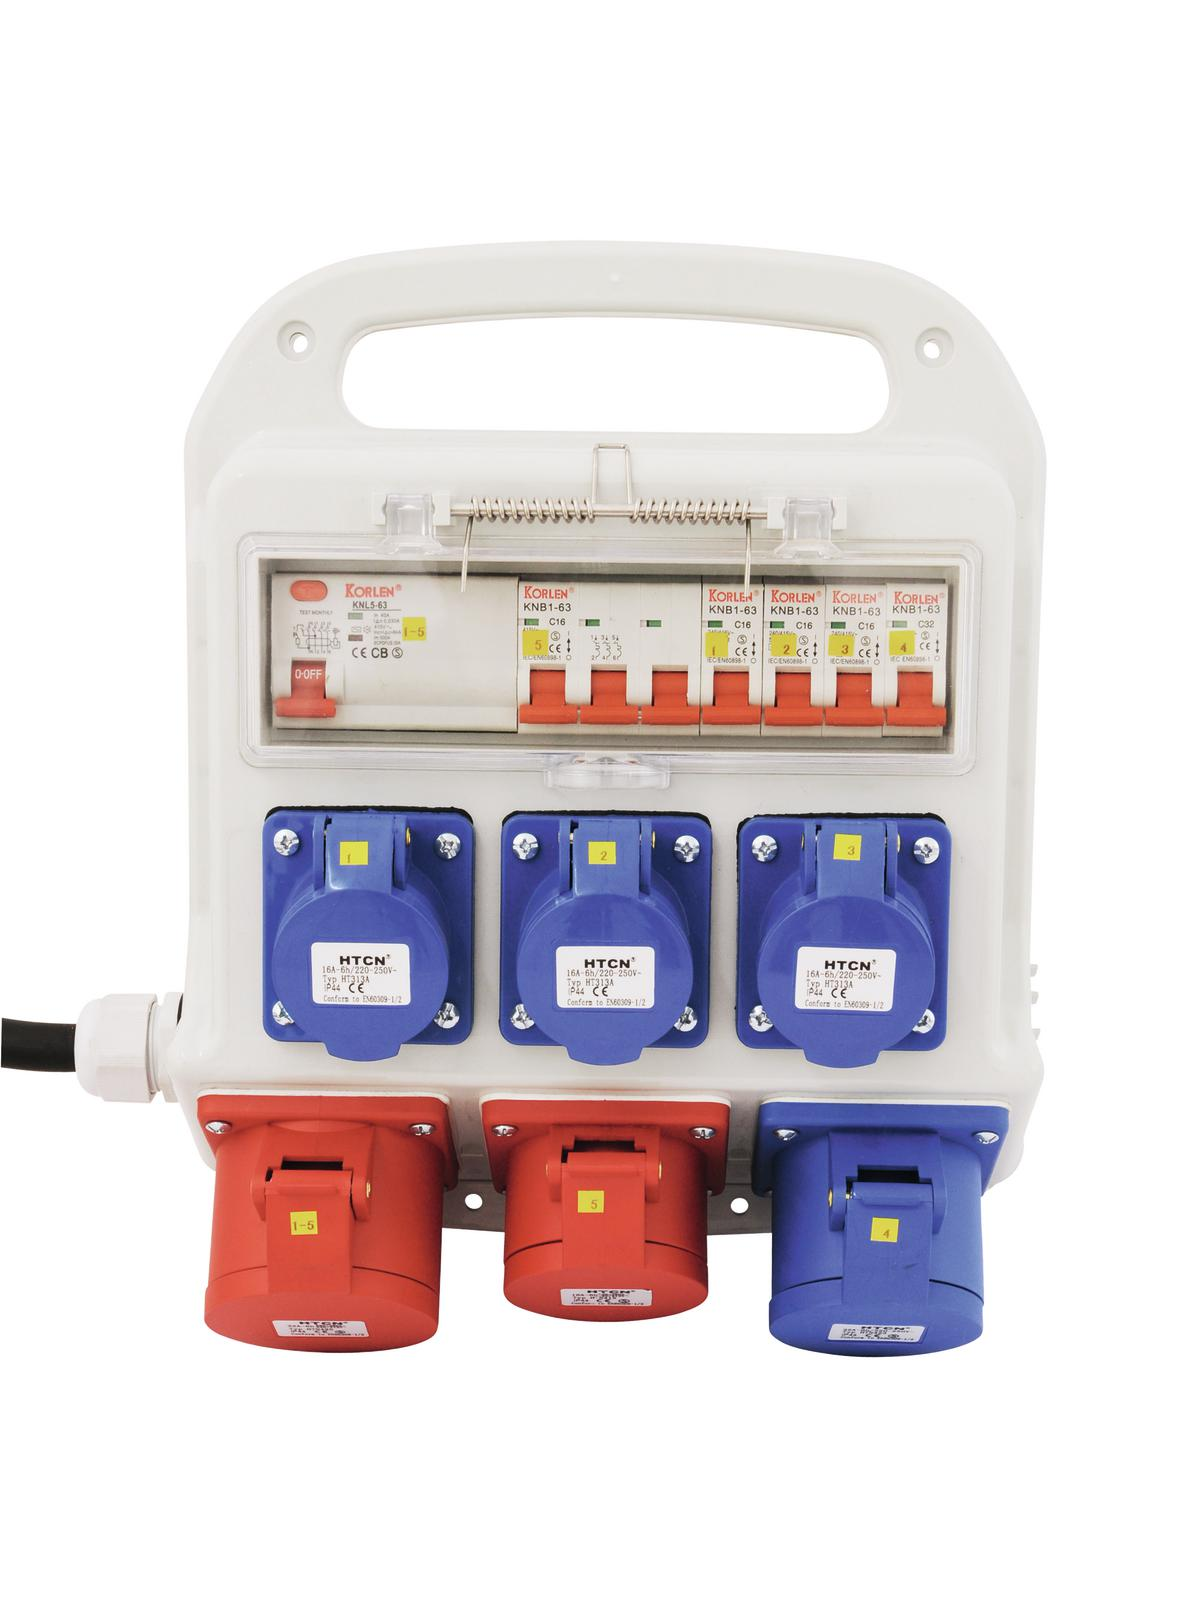 Power distributor rack EEC EUROLITE 3x 32A, 1x16A, 3x230V SBP-3210K